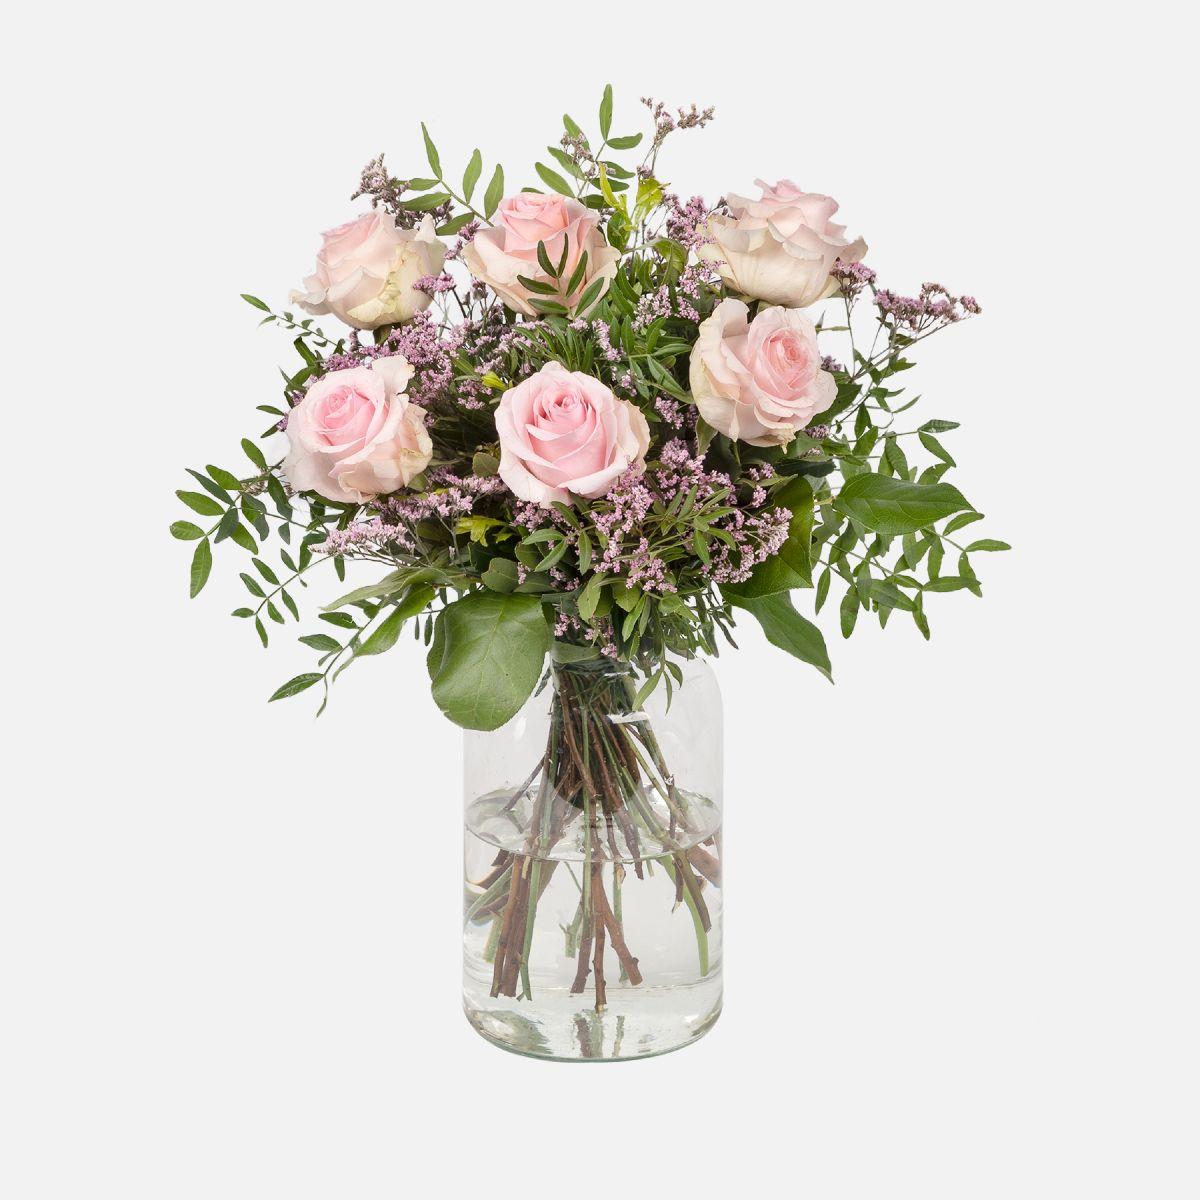 Fiori a domicilio - Rose rosa e Limonium - Sundays - Colvin